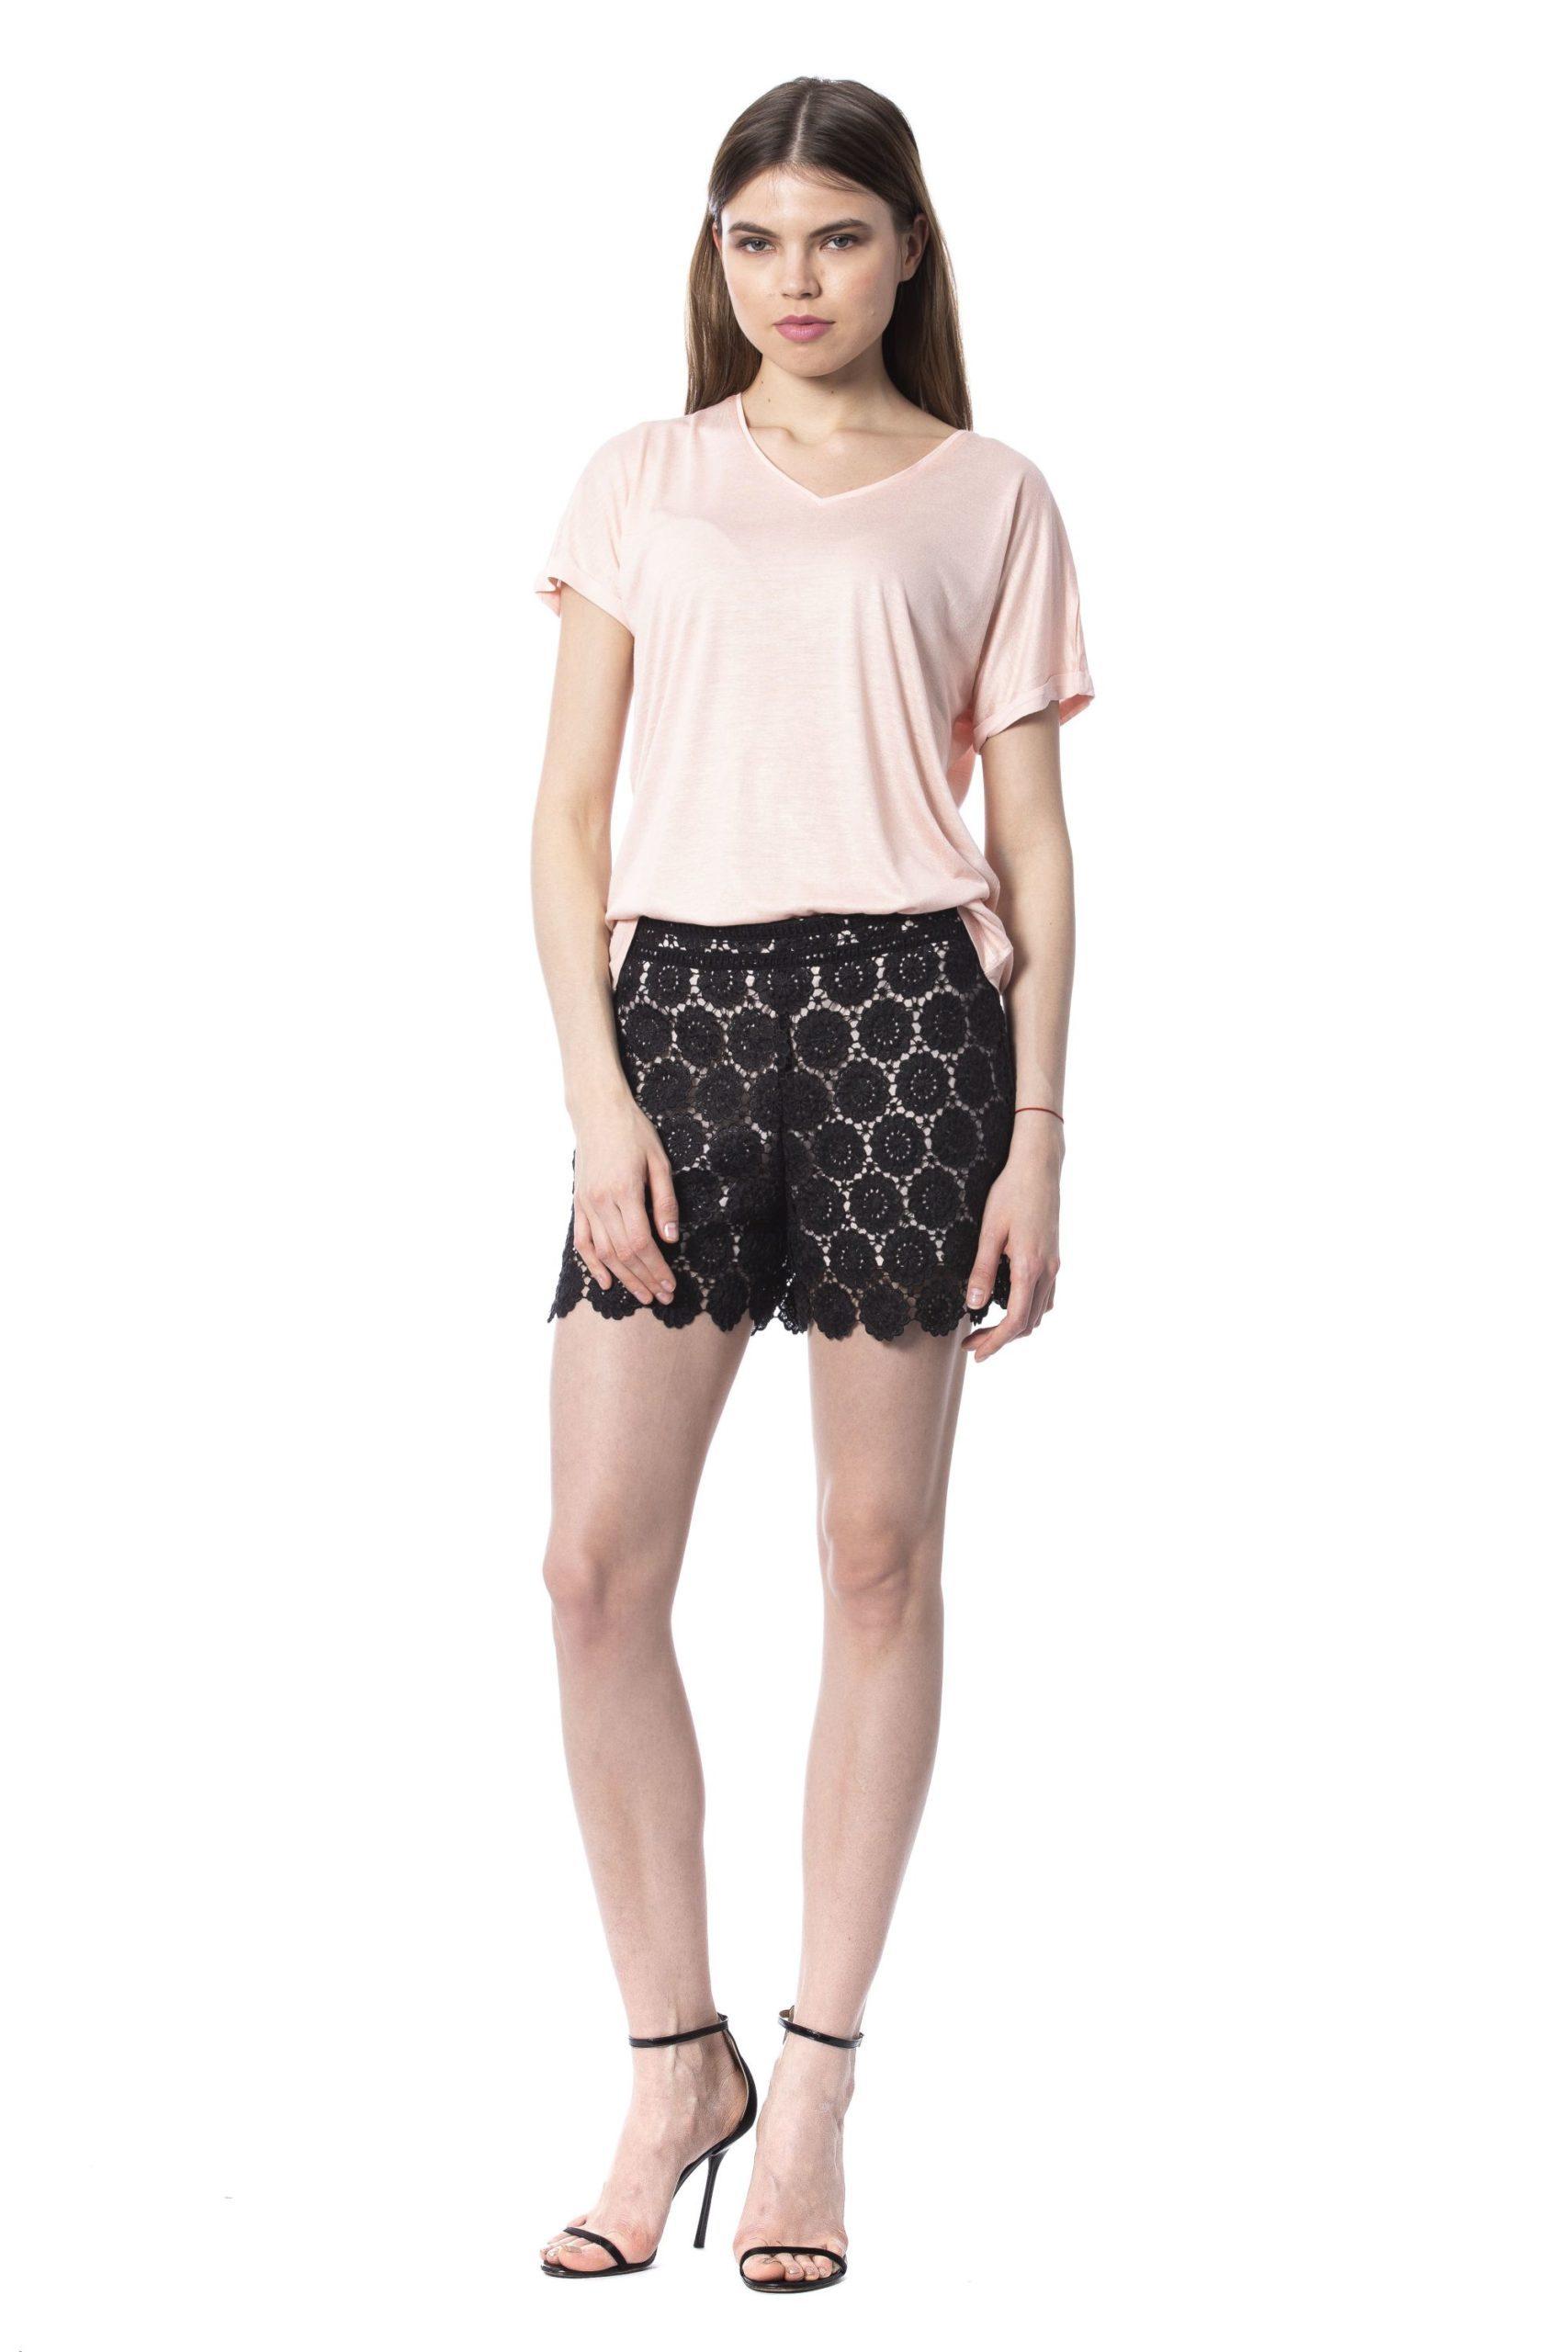 Silvian Heach Women's Pinkpowder T-Shirt Pink SI1235130 - XS